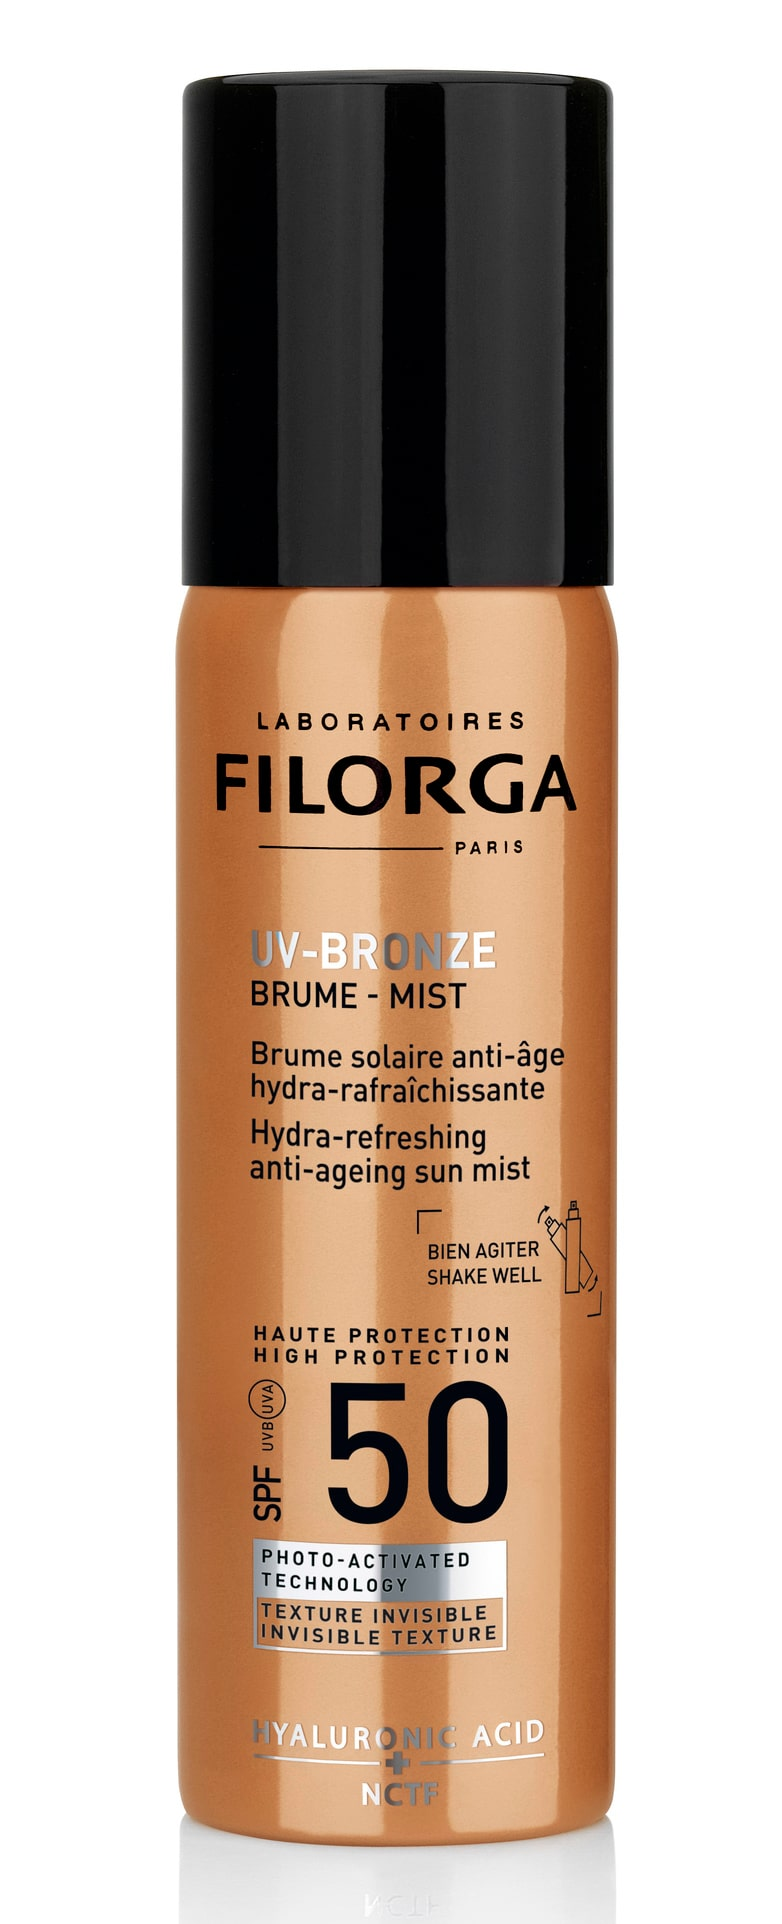 UV bronze face mist, Filorga.